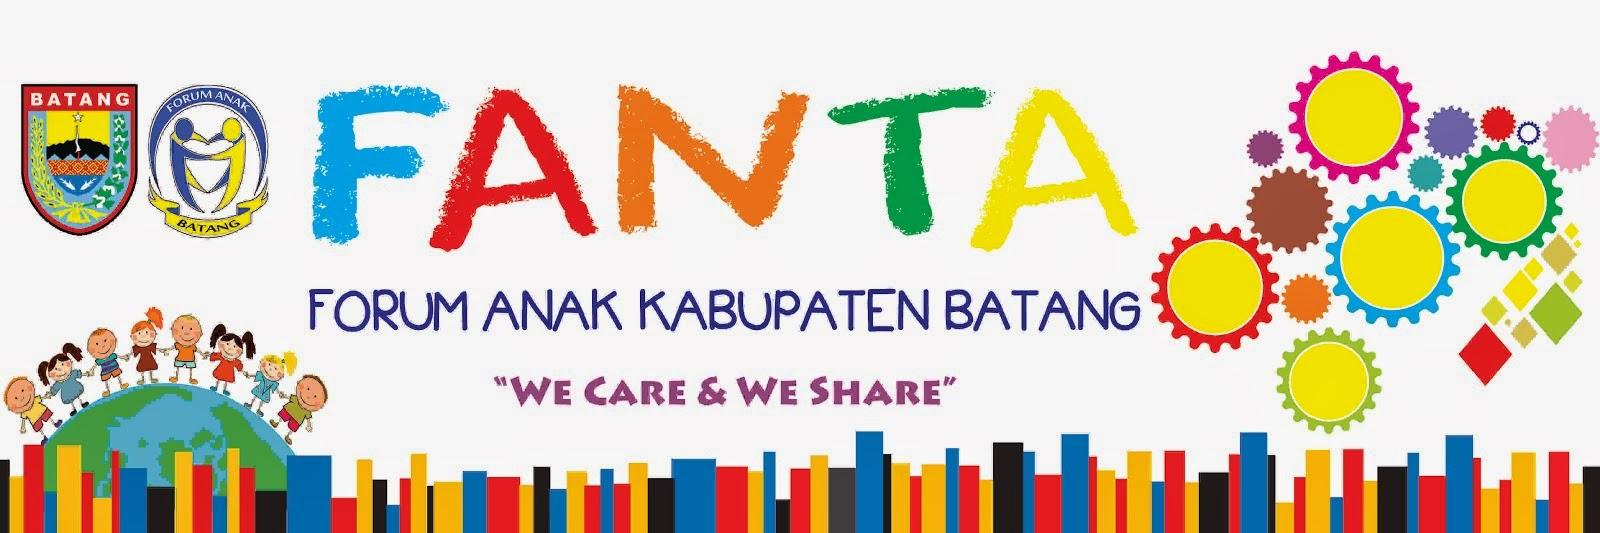 Forum Anak Kabupaten Batang (FANTA)